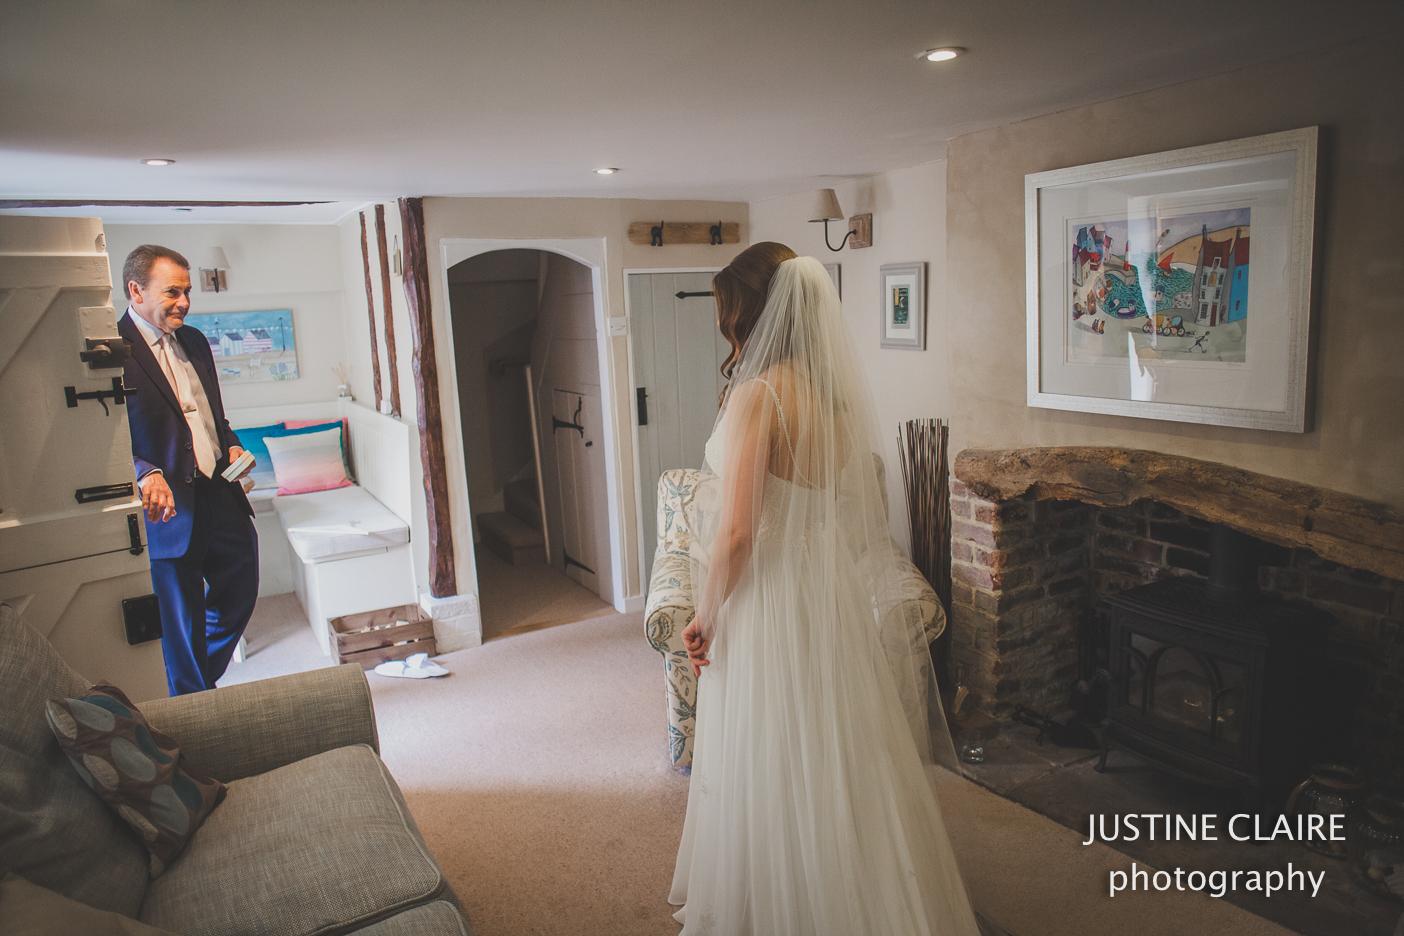 Fitzleroi Fittleworth petworth Billingshurst farm Wedding Photography by Justine Claire photographer Arundel Worthing Brighton-9.jpg